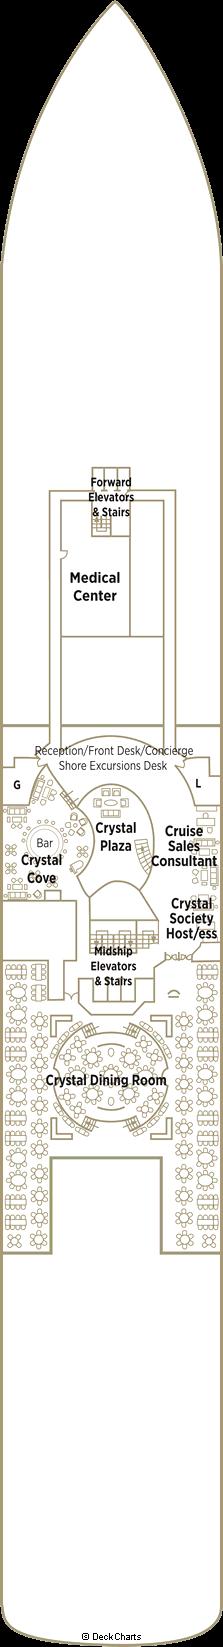 Crystal Serenity: Crystal Deck